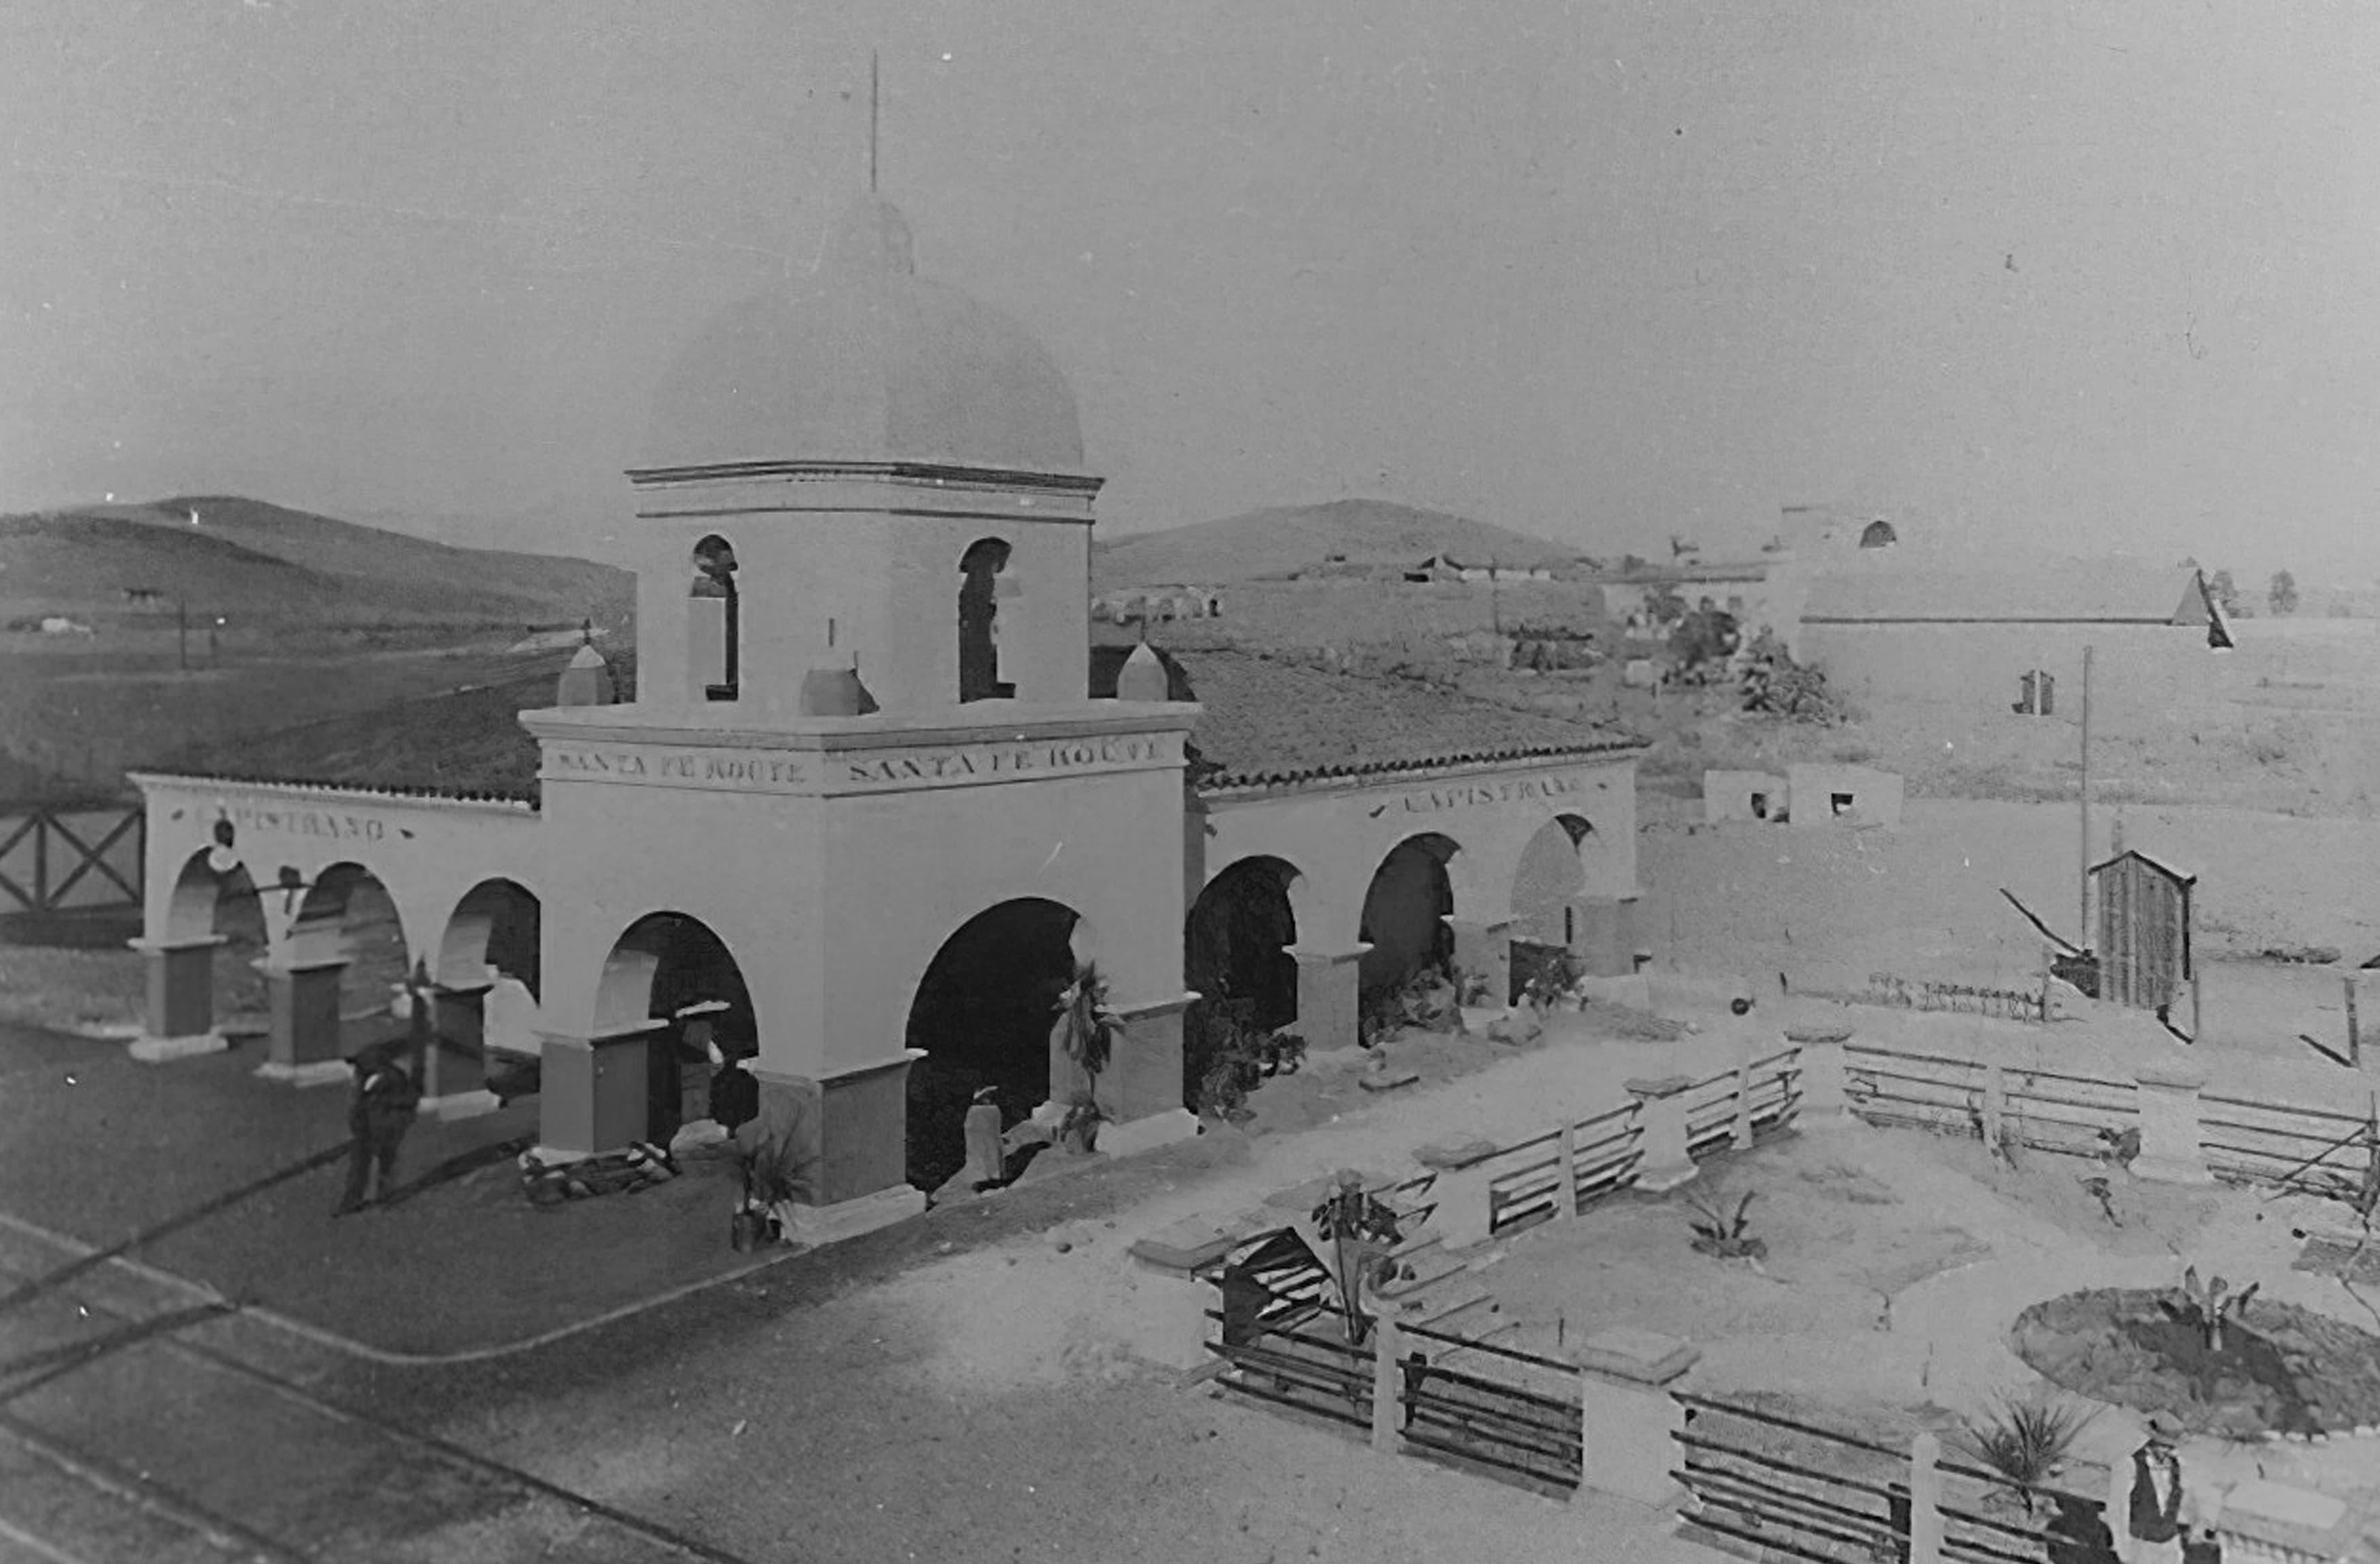 The historic roots of River Street in San Juan Capistrano, California.